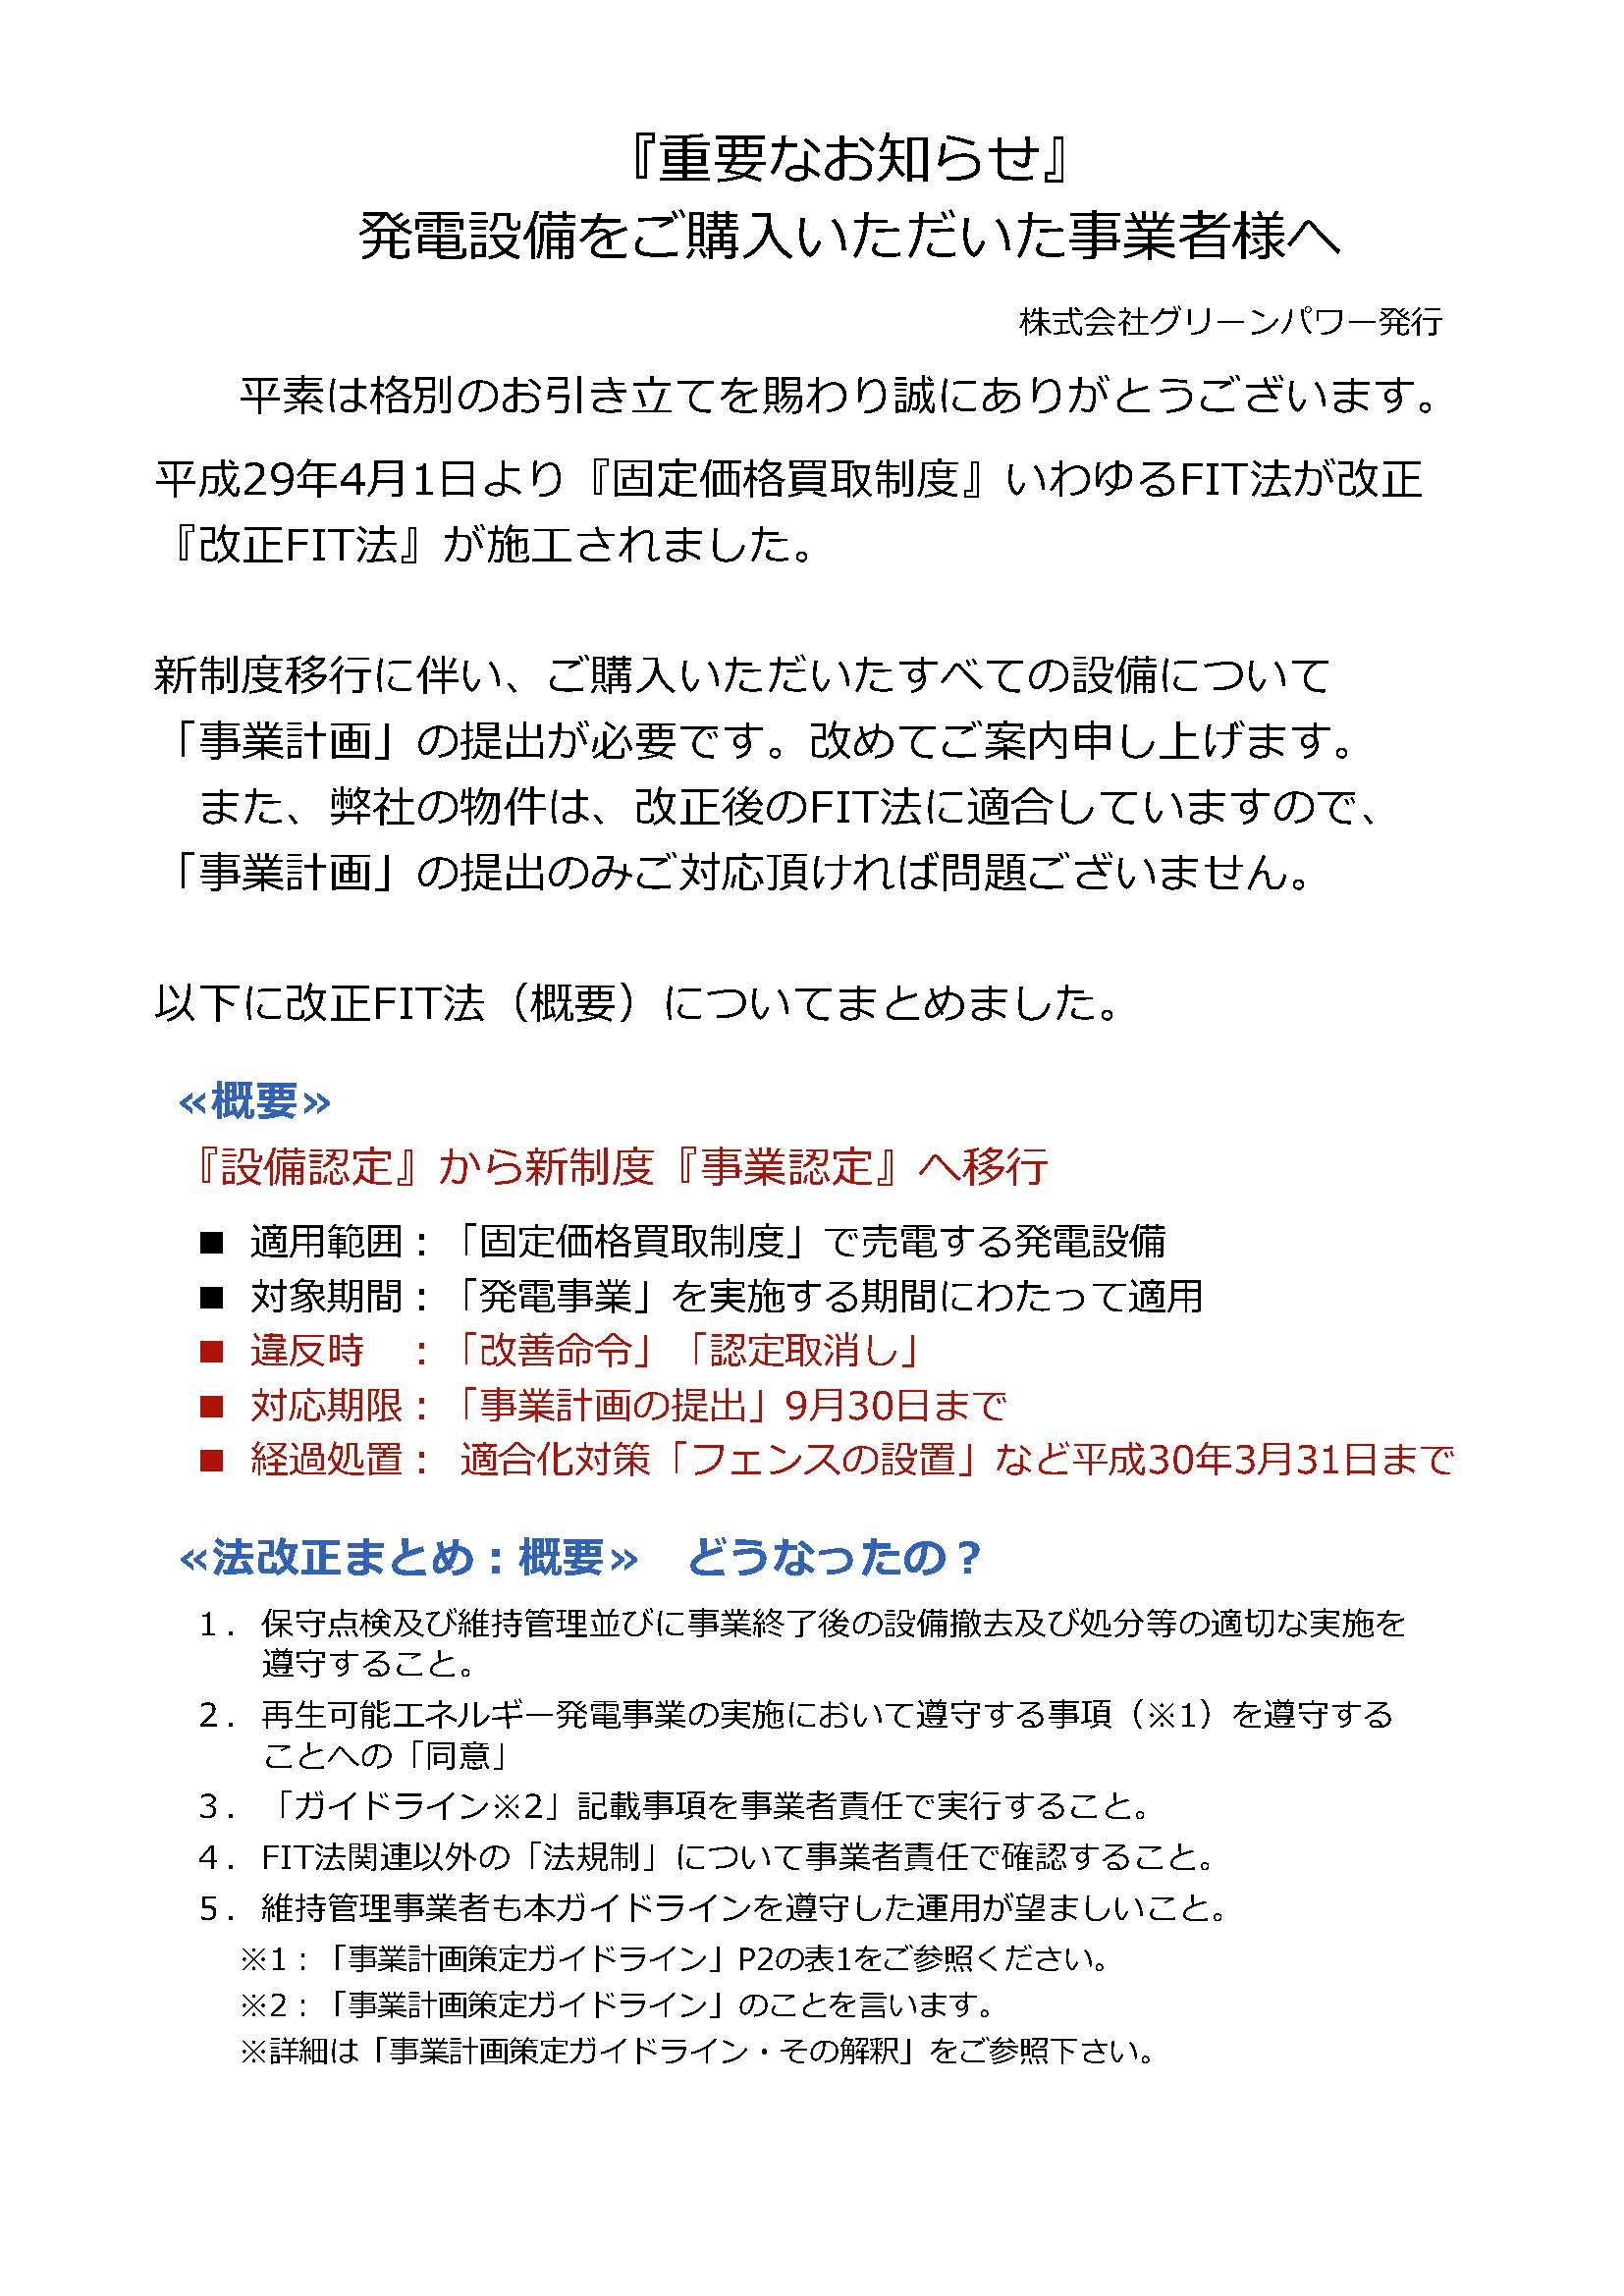 OHIRASE20170512-1 (1)_ページ_1.jpg